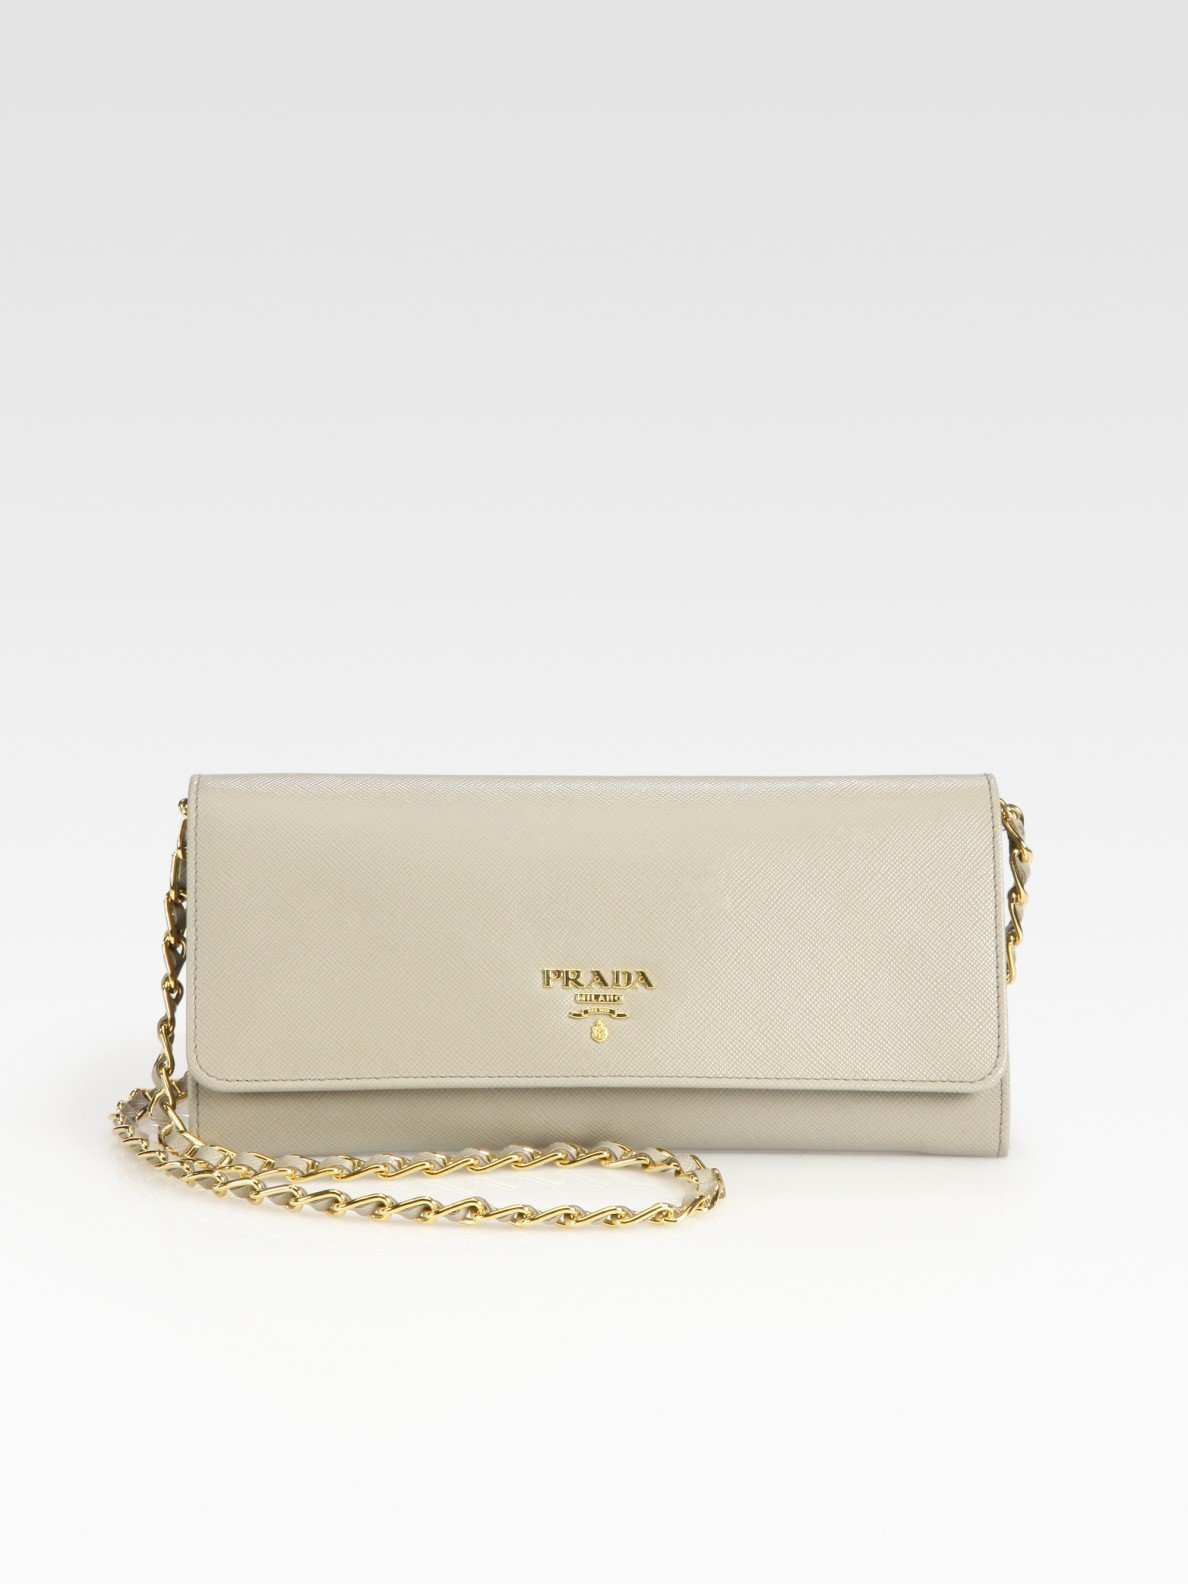 42c9c5451e17f Lyst - Prada Saffiano Wallet with Chain in Natural